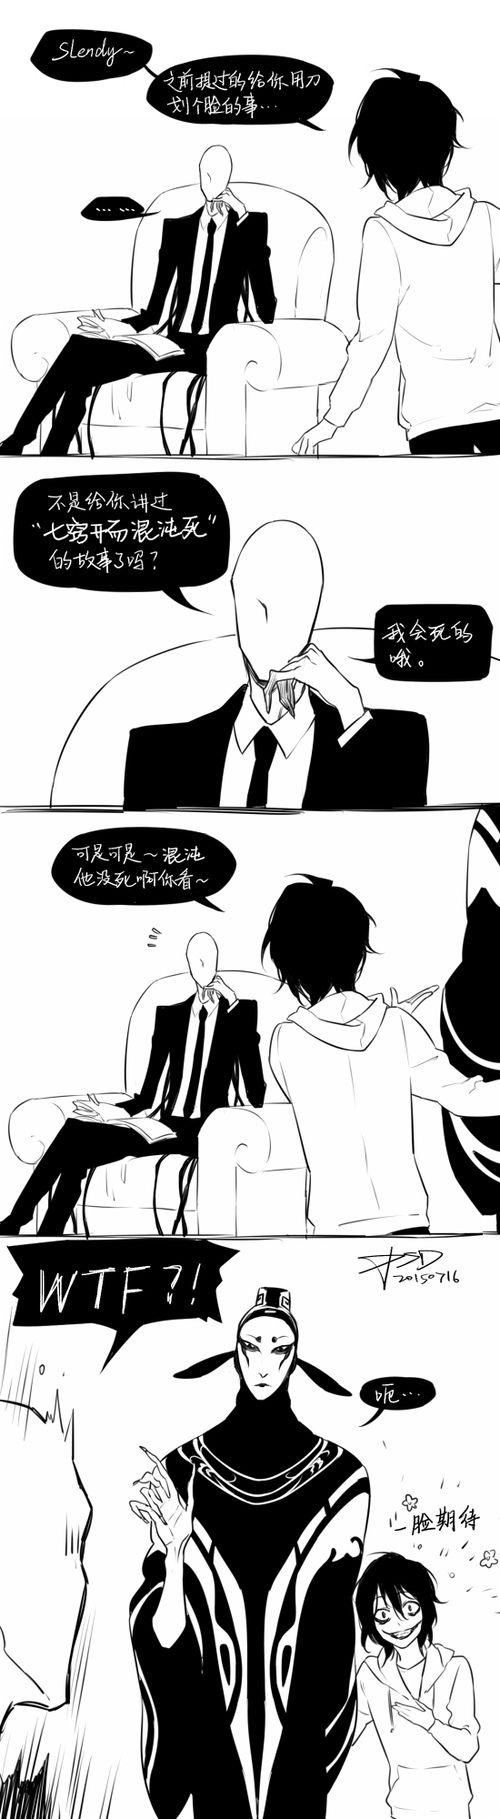 slenderman 厌世。>>> wish I knew what it says